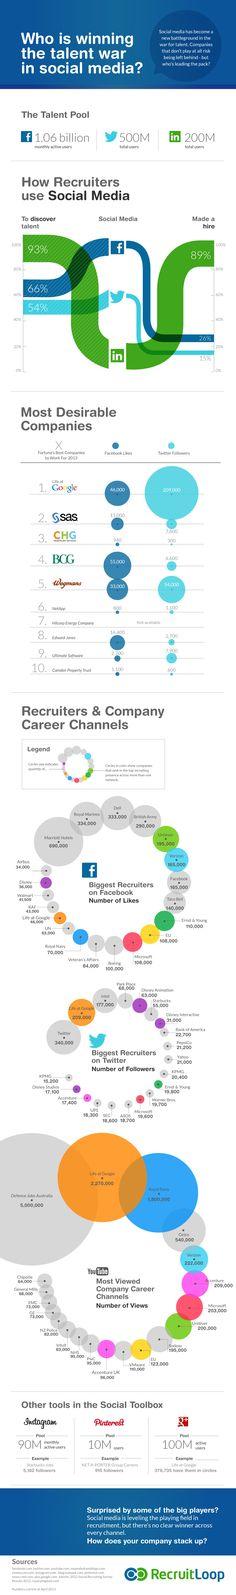 Social Media Recruiting in 2013